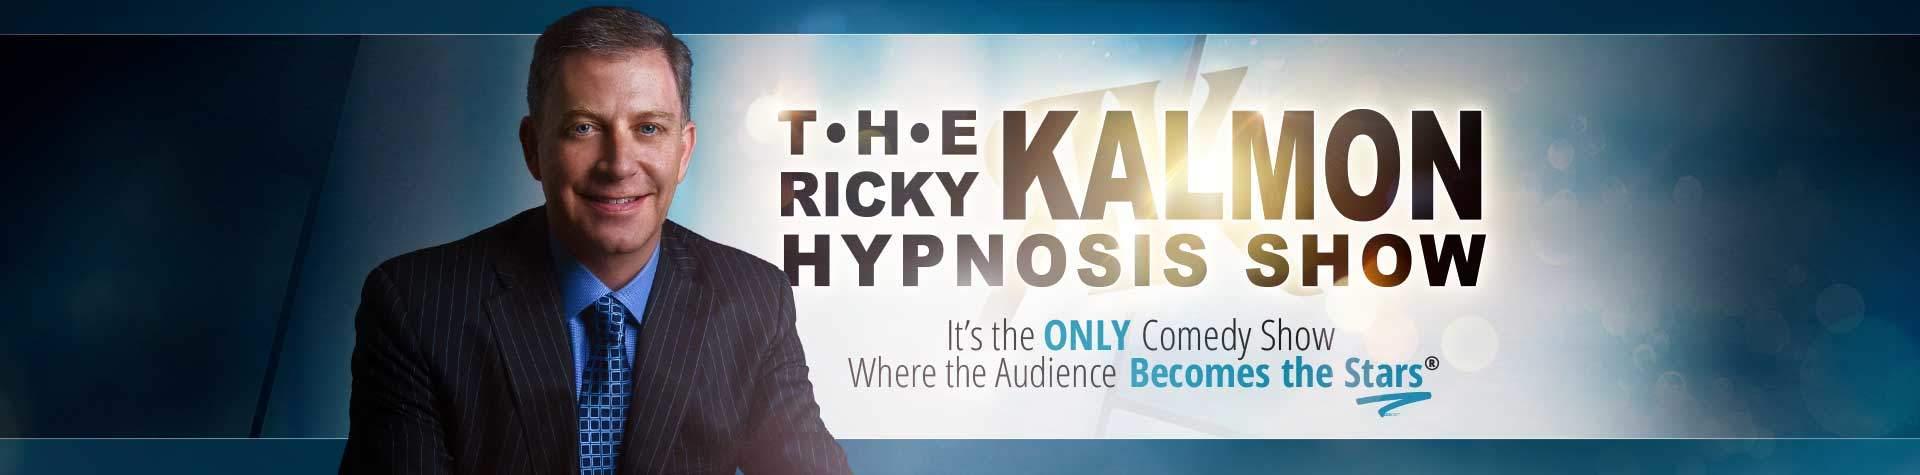 Ricky Kalmon Corporate Entertainment